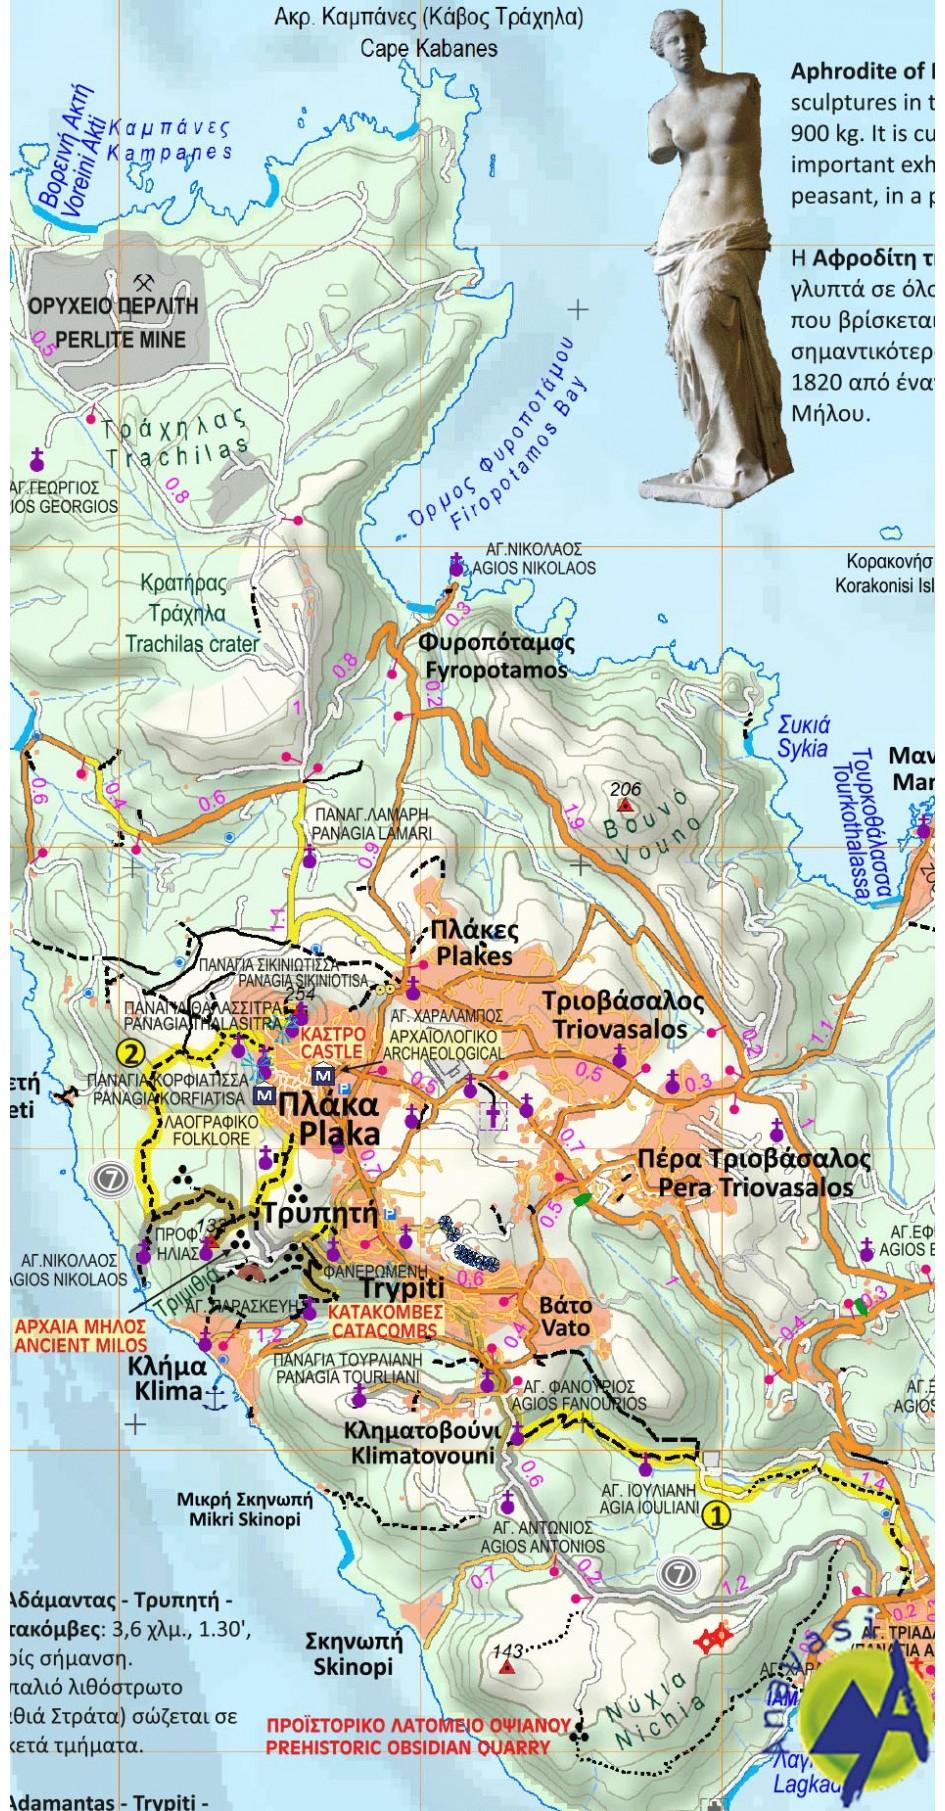 Milos-Kimolos-Polyvos • Hiking map 1:32.000